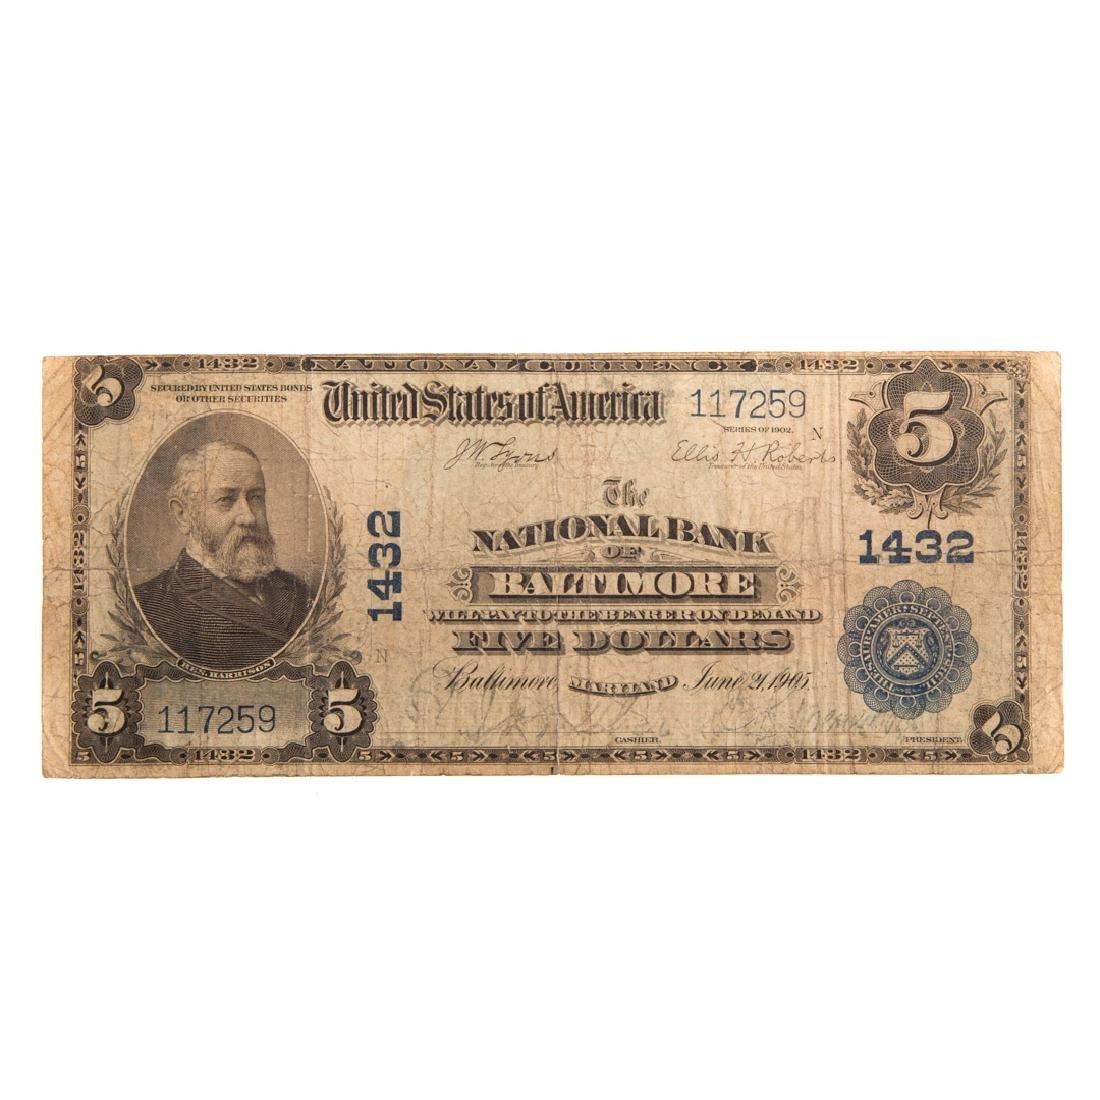 [US] 1902 $5 Plain Back Ch# 1432 FR-598 Baltimore